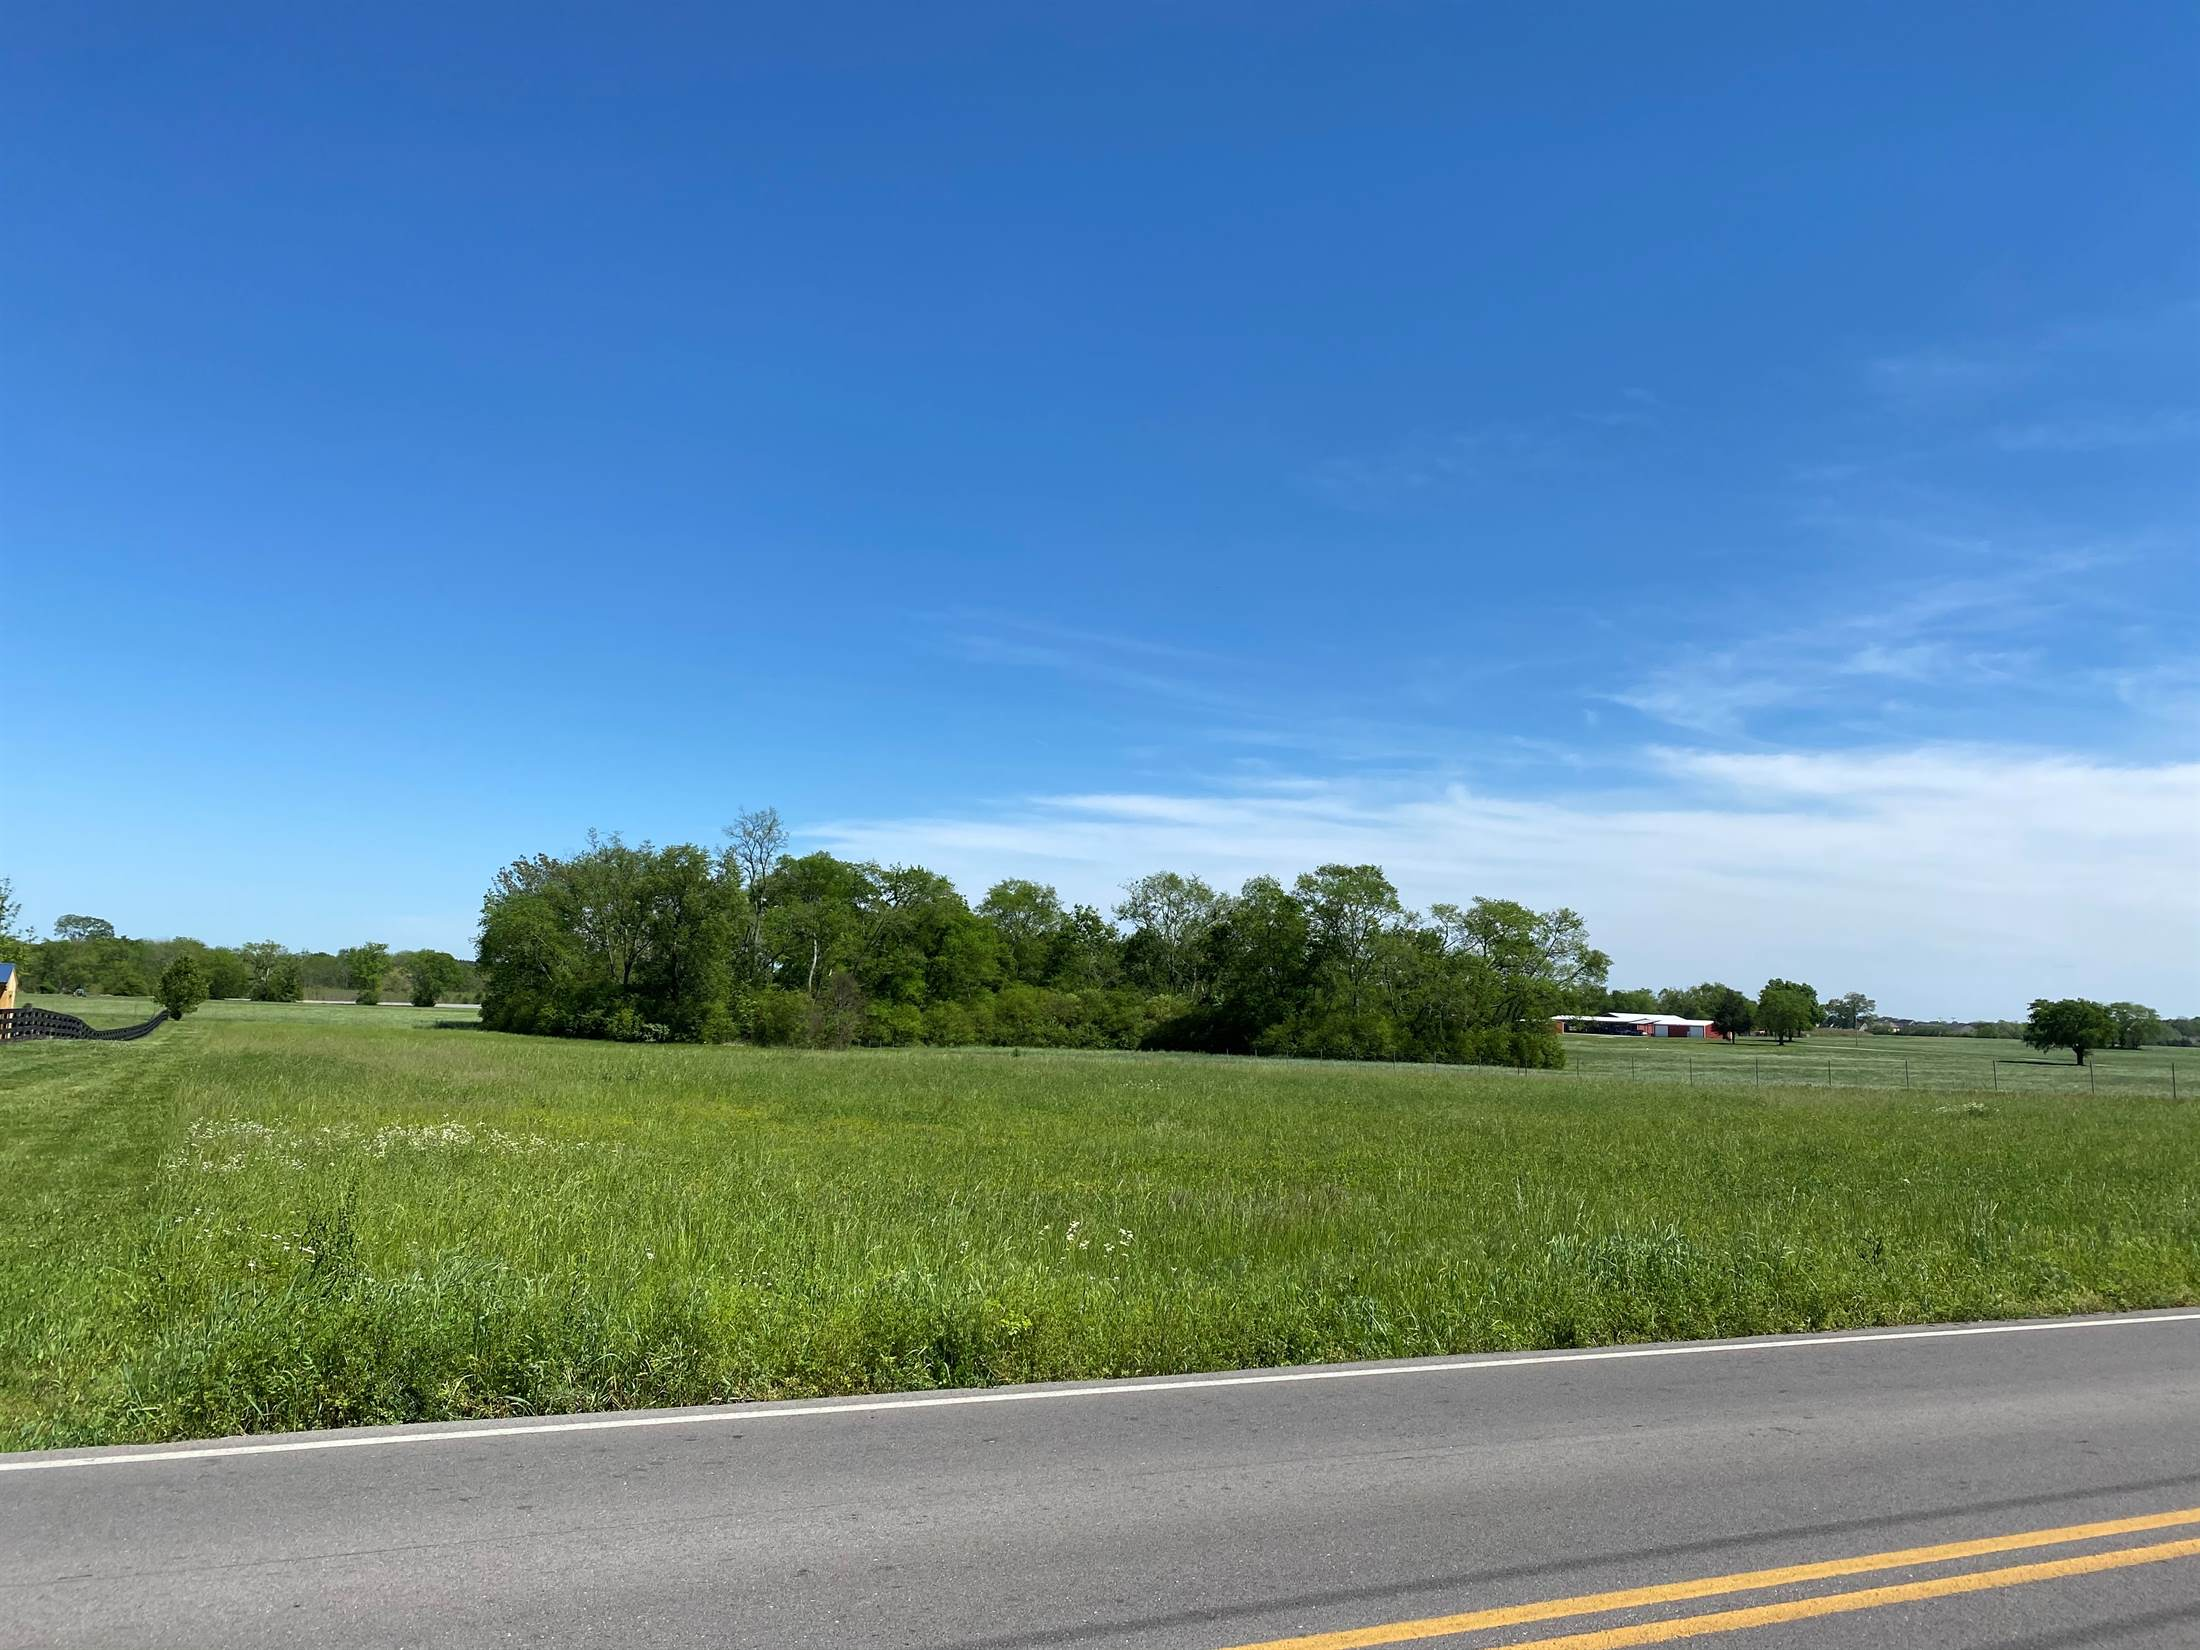 0 Leanna Rd, Murfreesboro, TN 37129